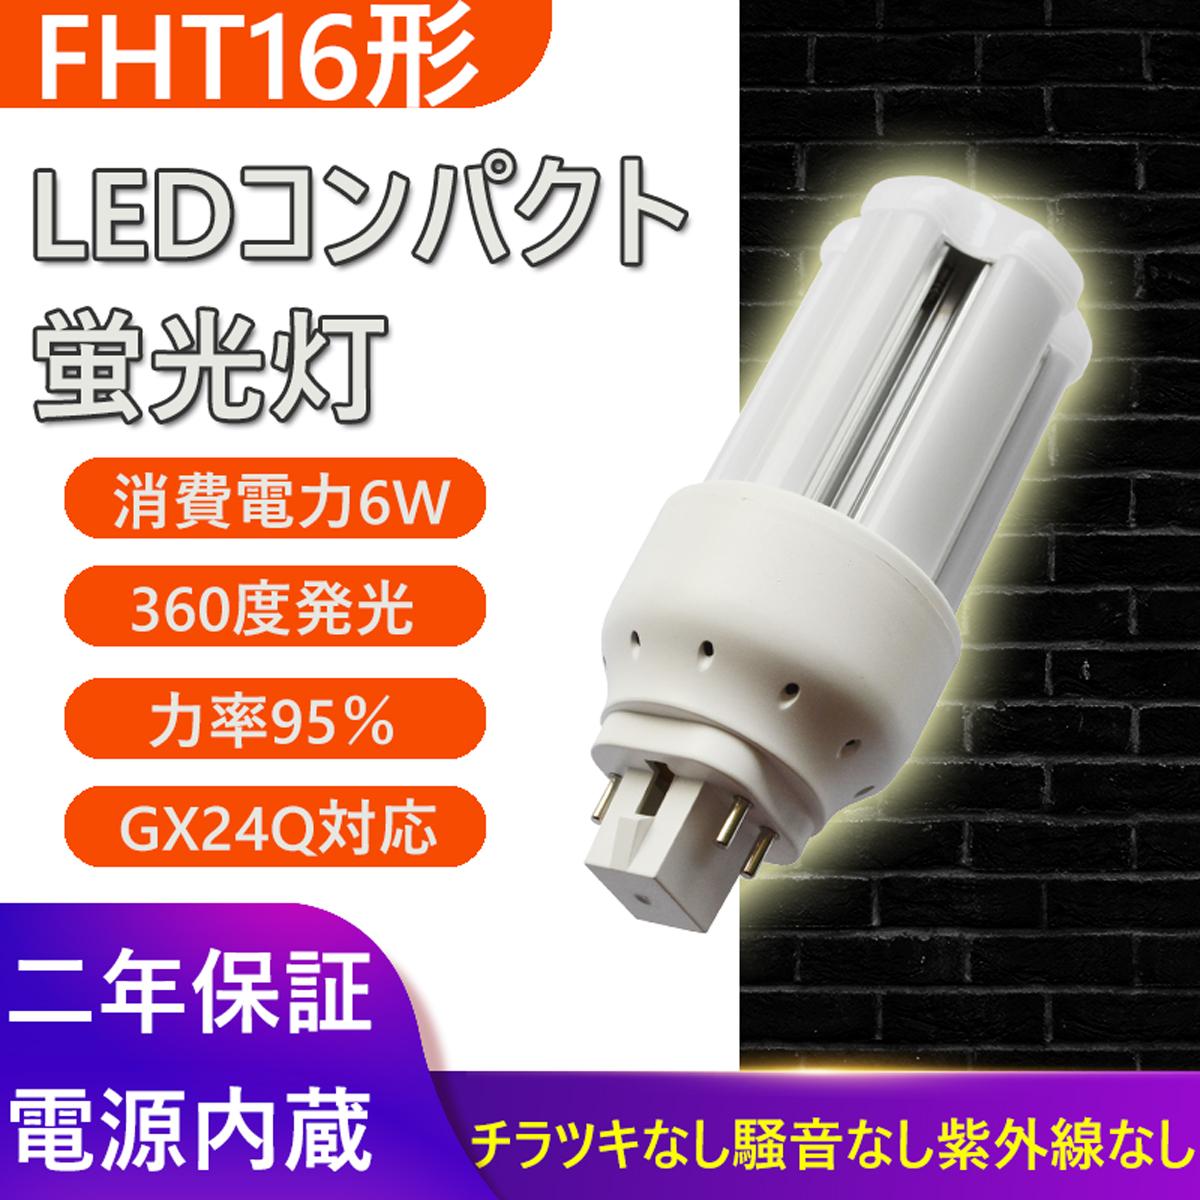 定番 FHT16形 FHT16EX-L FHT16EX-W FHT16EX-N FHT16EX-D GX24Q通用 三菱 パナソニック 日立 東芝 代替可能です FHT16EXL FHT16EXW ツイン3 GX24Q FHT16EXD FHT16W形 FHT16EX 蛍光灯 960LM FHT16EXN 昼白色 コンパクト形蛍光ランプ 高品質新品 6W 消費電力6W